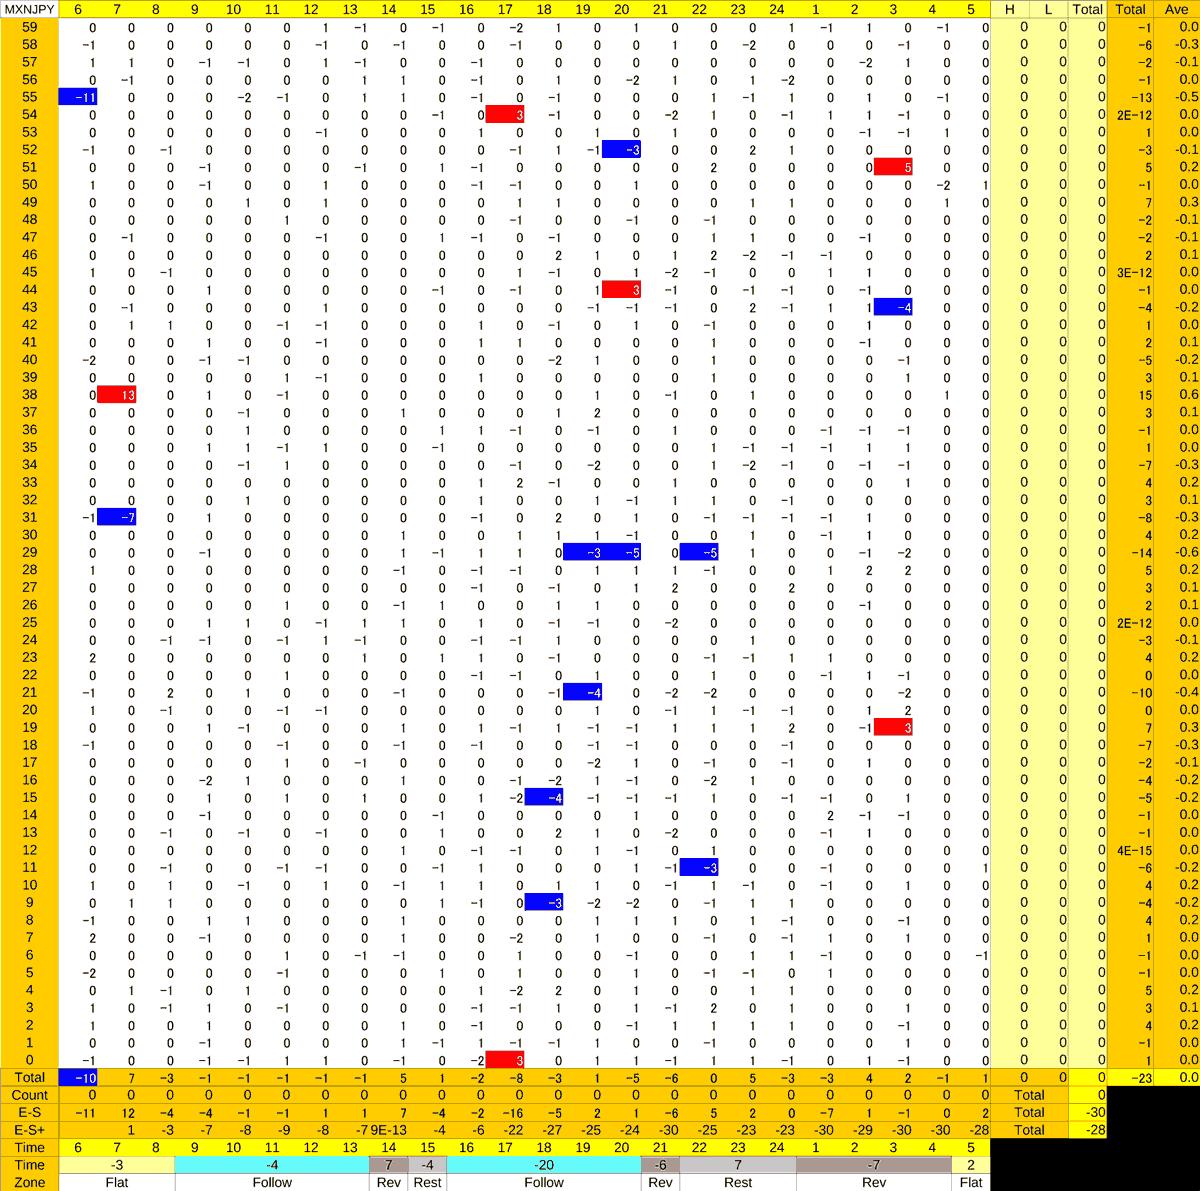 20201126_HS(3)MXNJPY